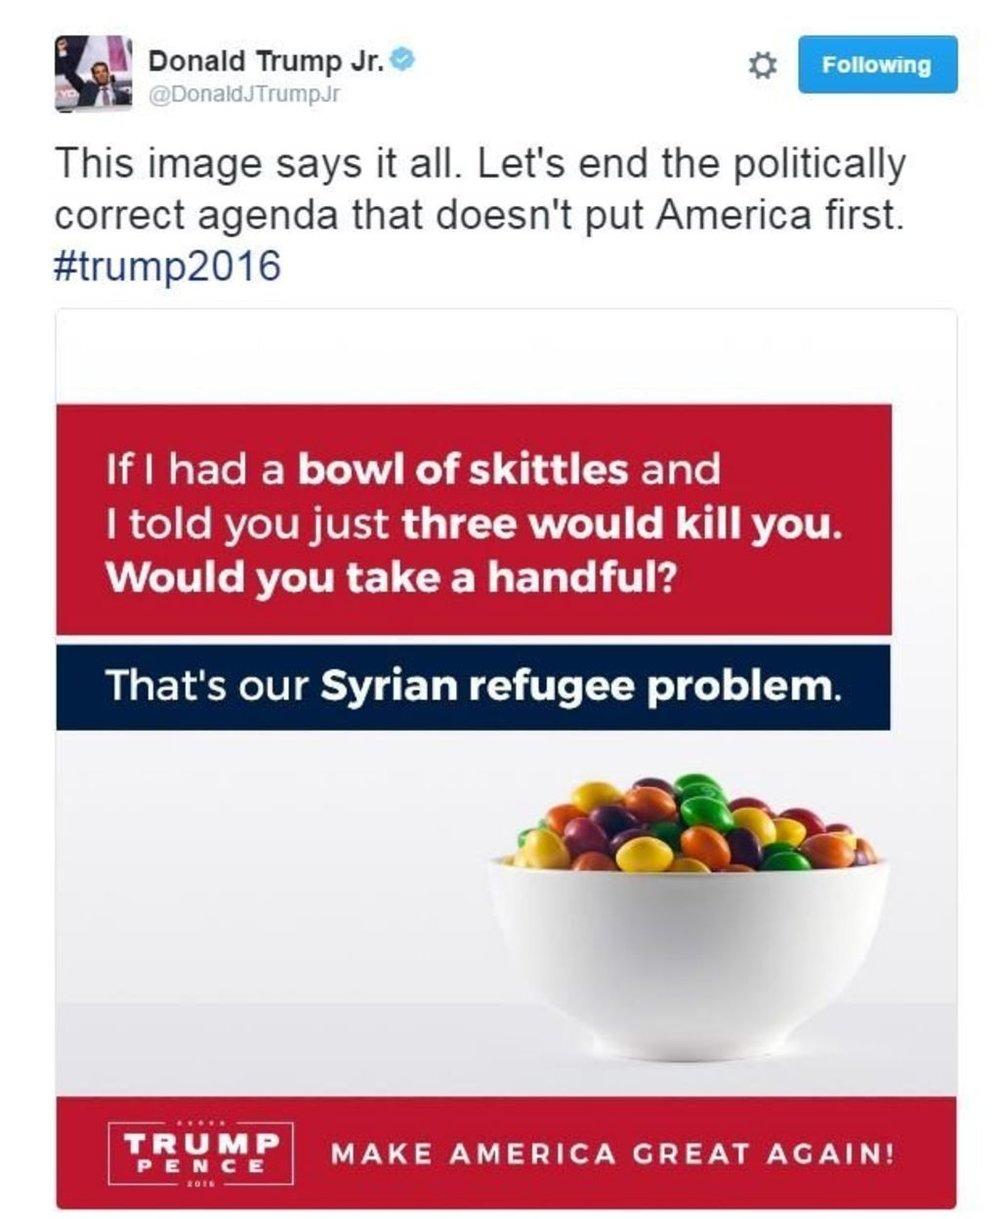 Example of anti-refugee rhetoric